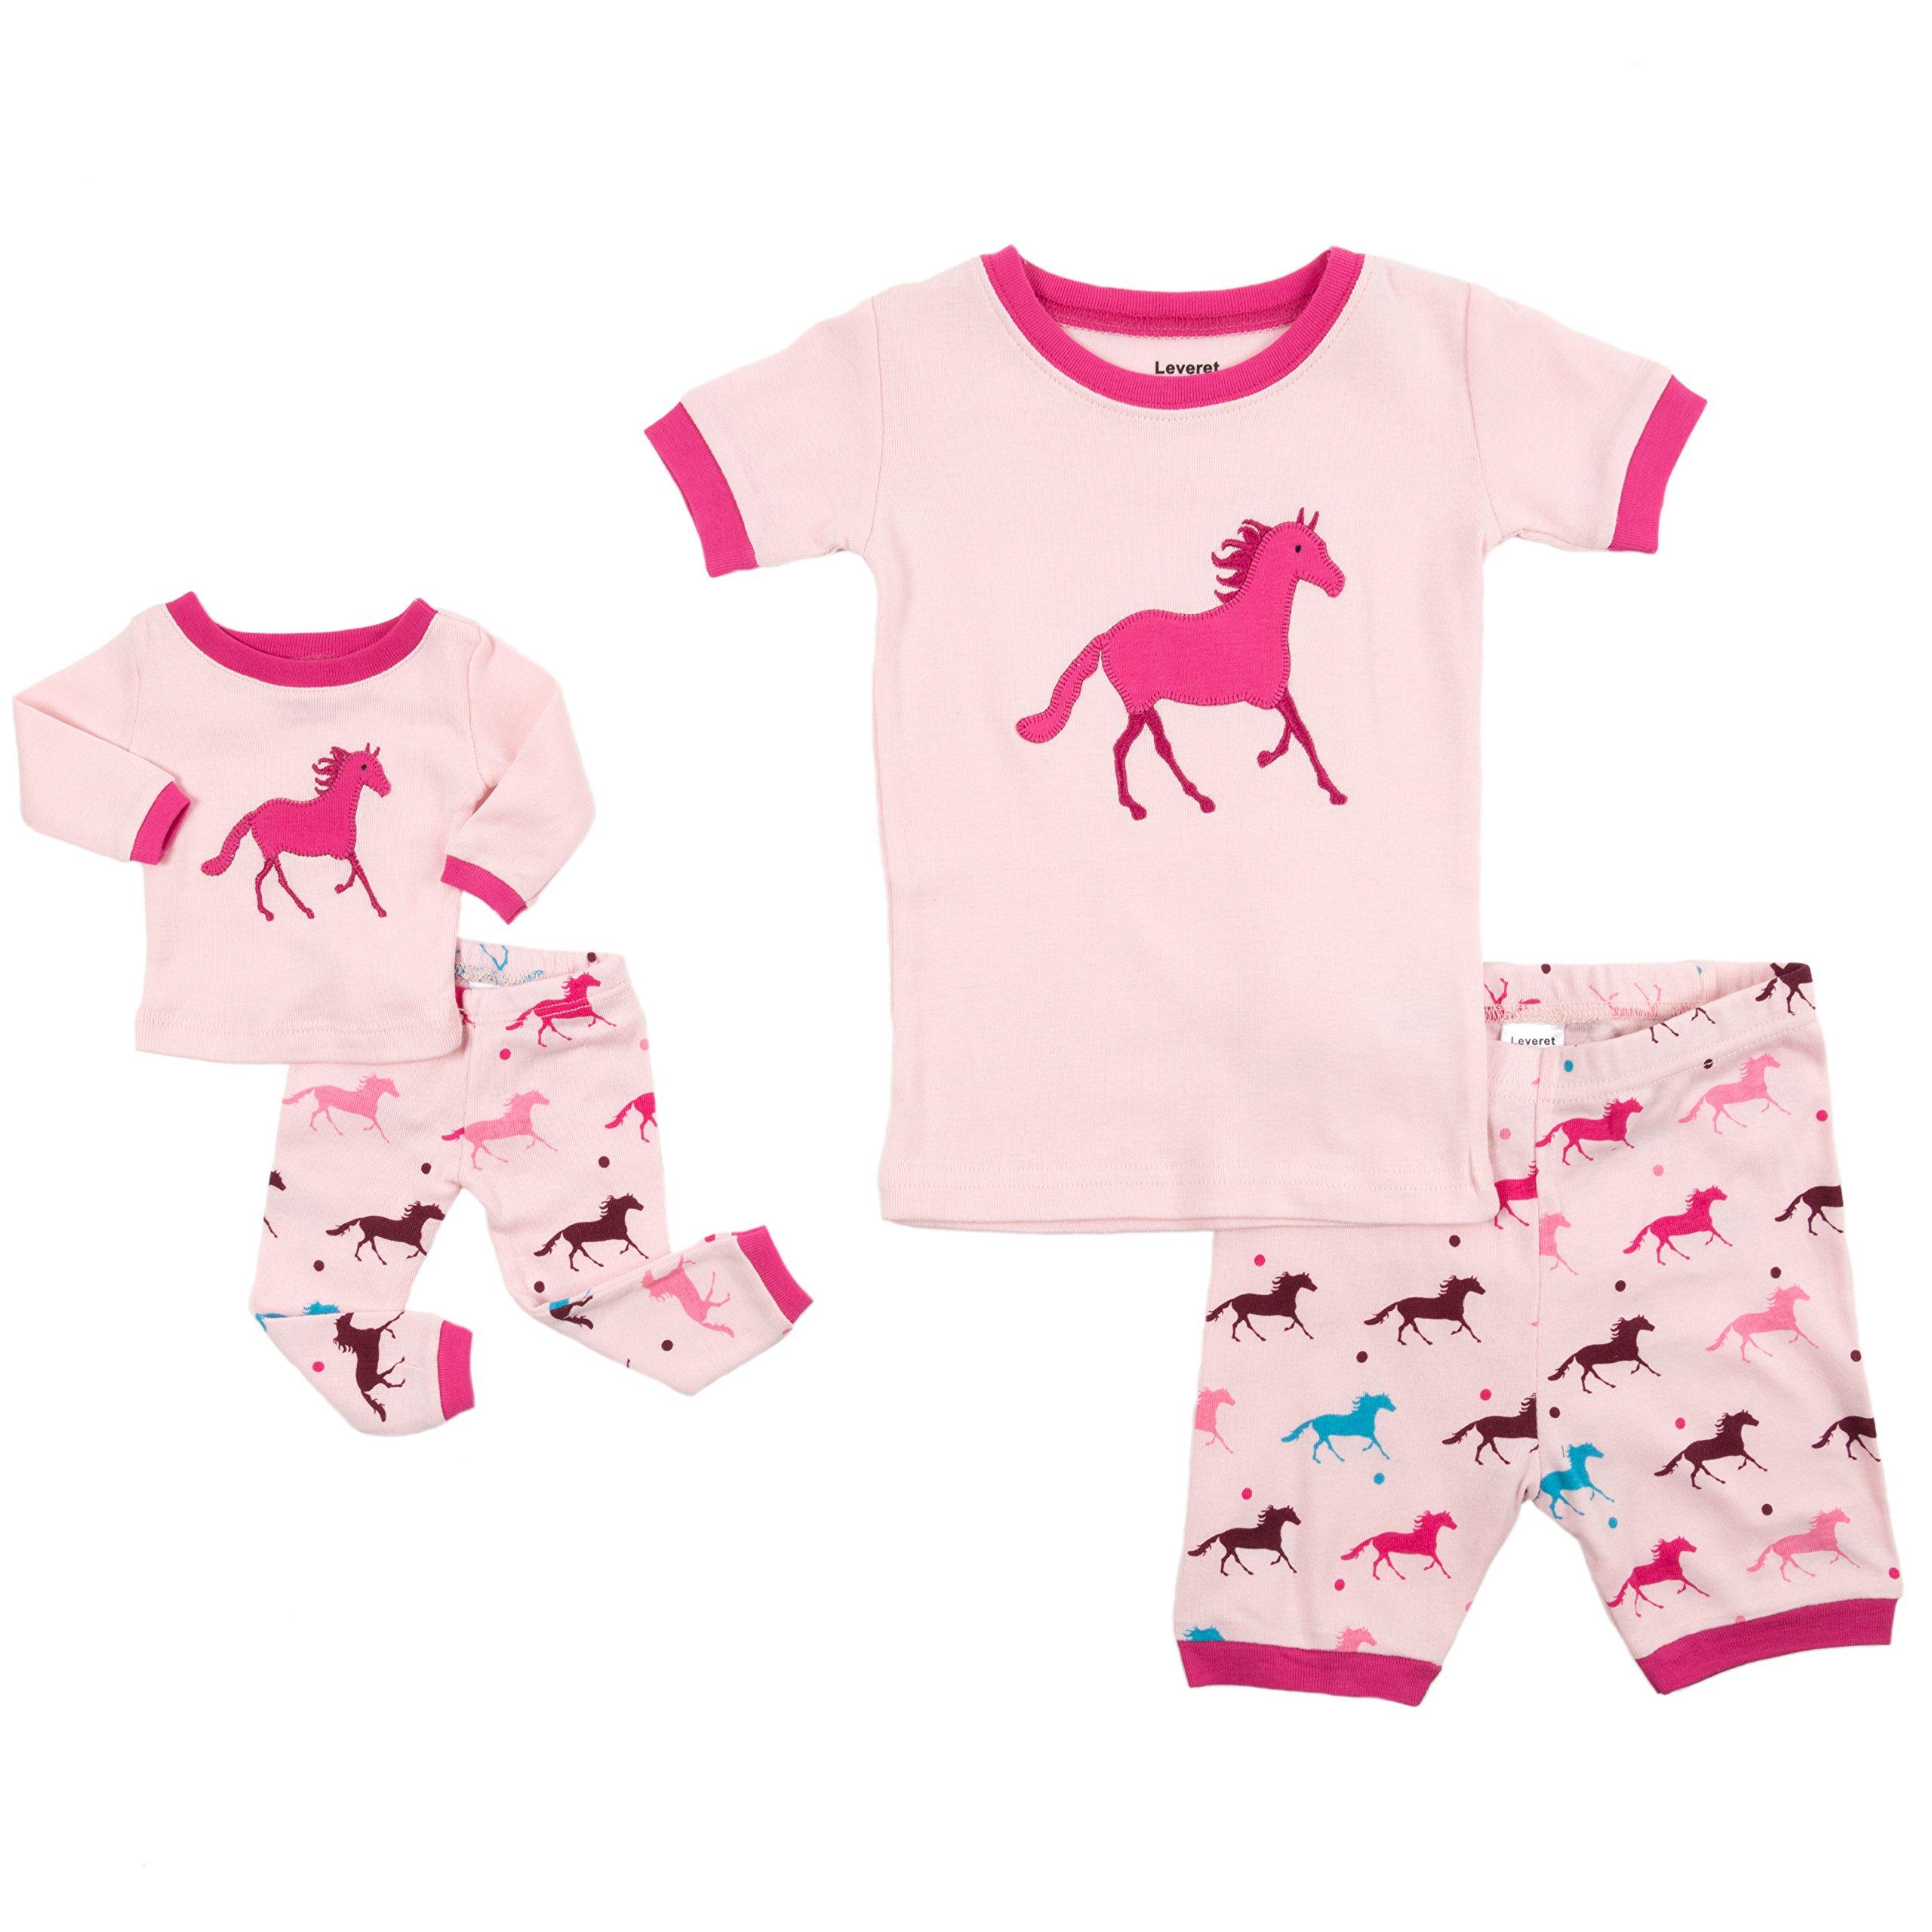 Leveret Shorts Matching Doll & Girl Horse 2 Piece Pajama Set 100% Cotton Size 8 Years